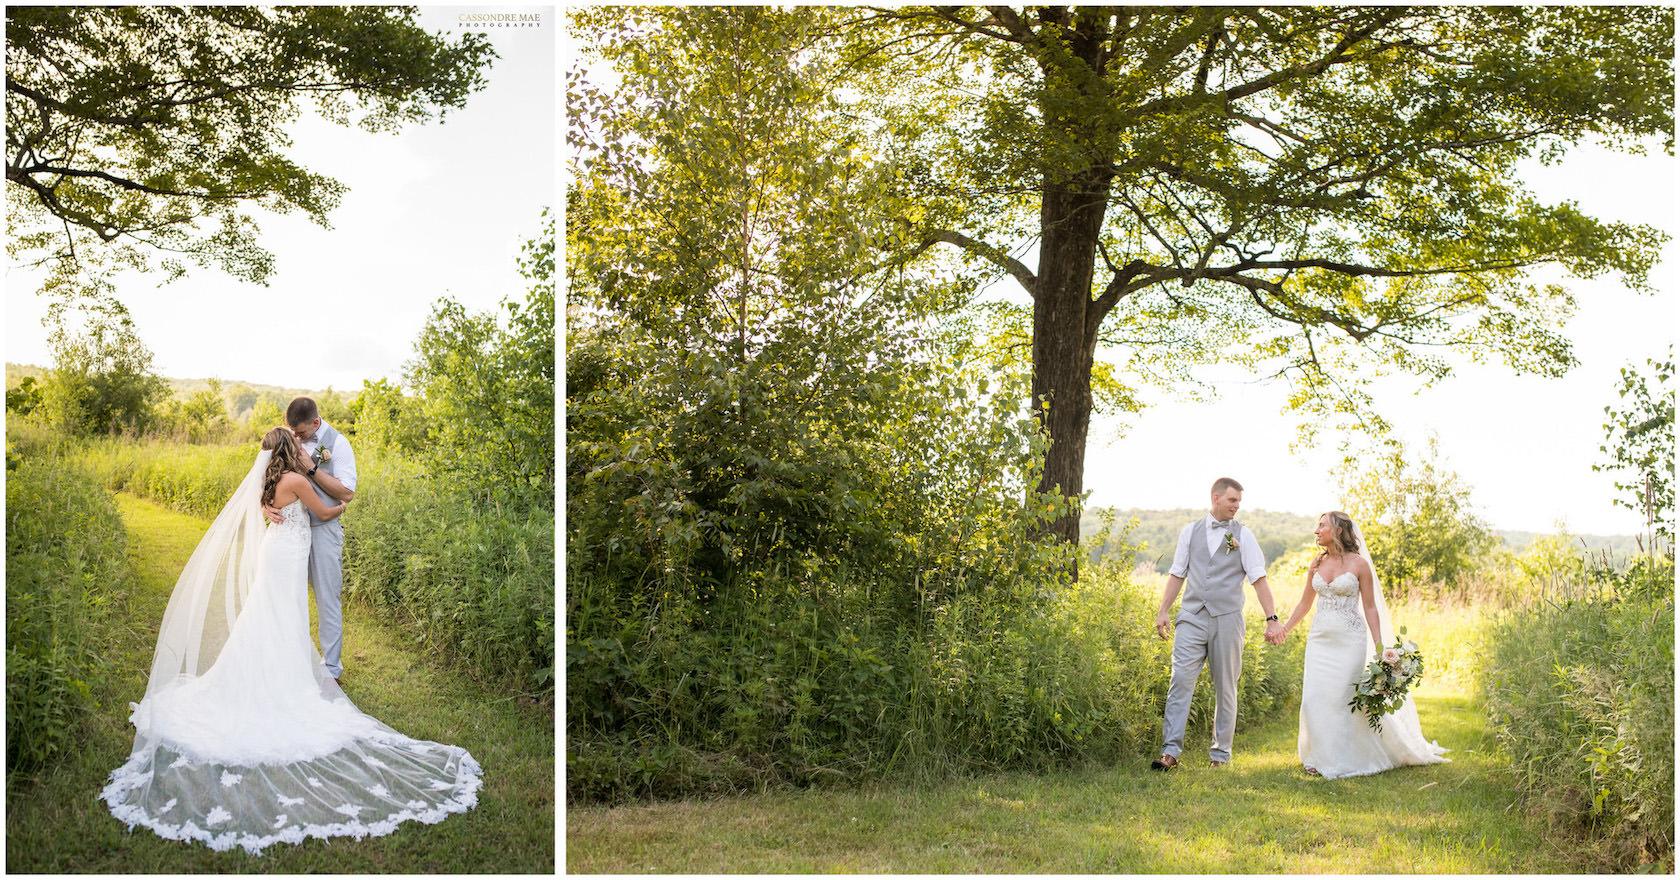 Cassondre Mae Photography Hudson Valley Wedding 23.jpg